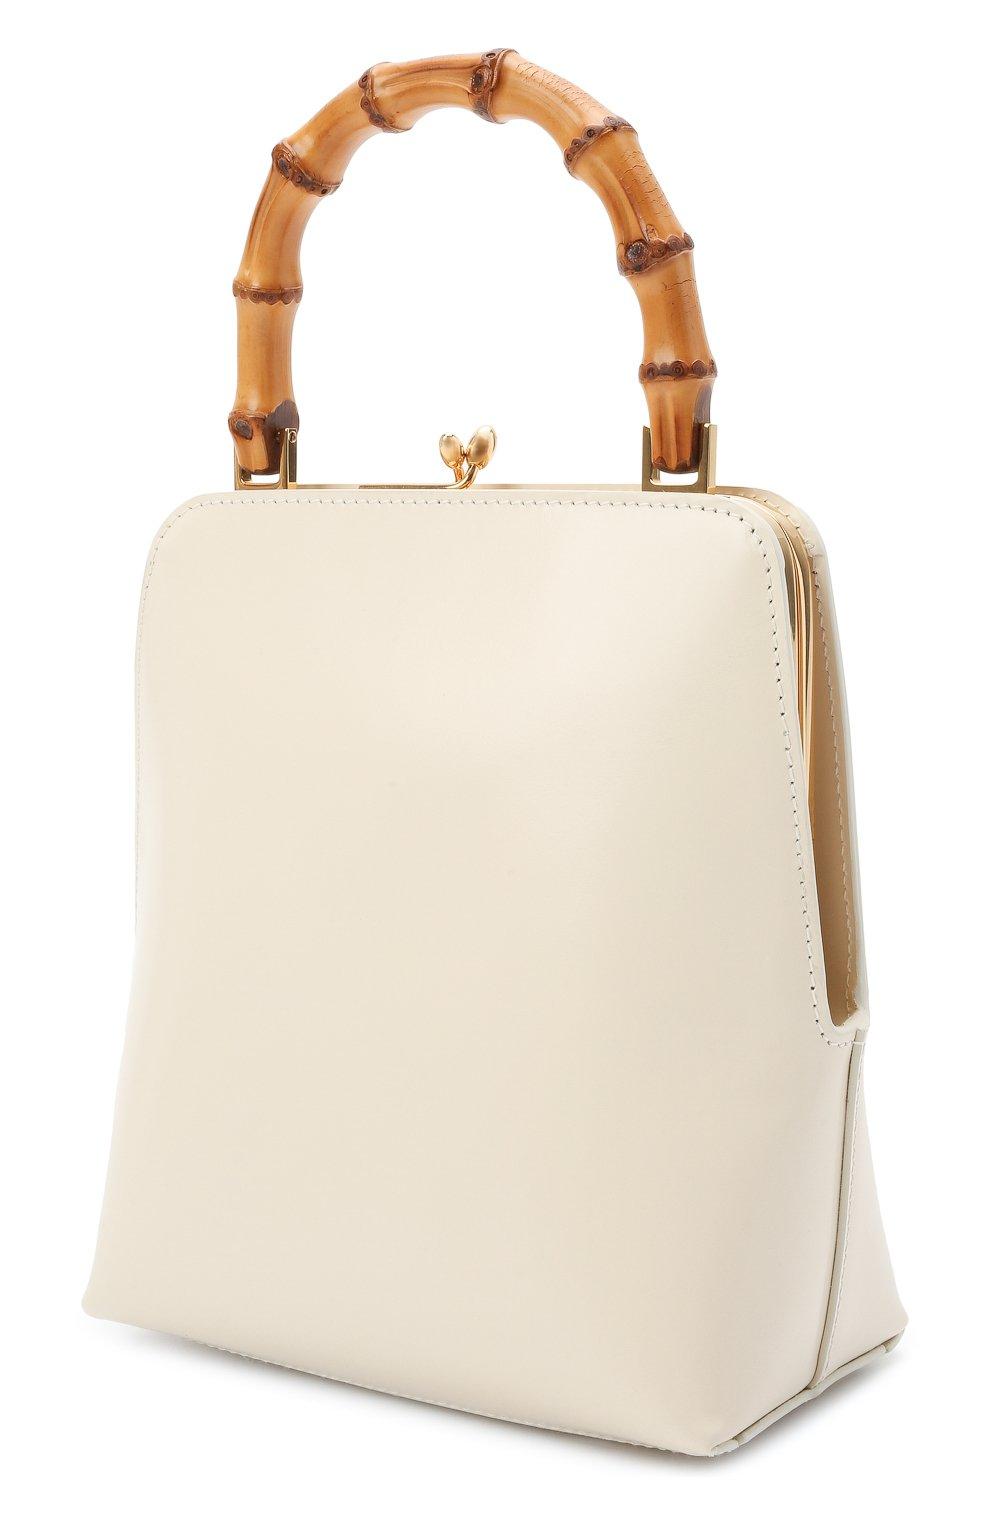 Женская сумка goji JIL SANDER кремвого цвета, арт. JSPT851578-WTB00080N | Фото 3 (Сумки-технические: Сумки top-handle; Размер: medium, mini; Материал: Натуральная кожа)